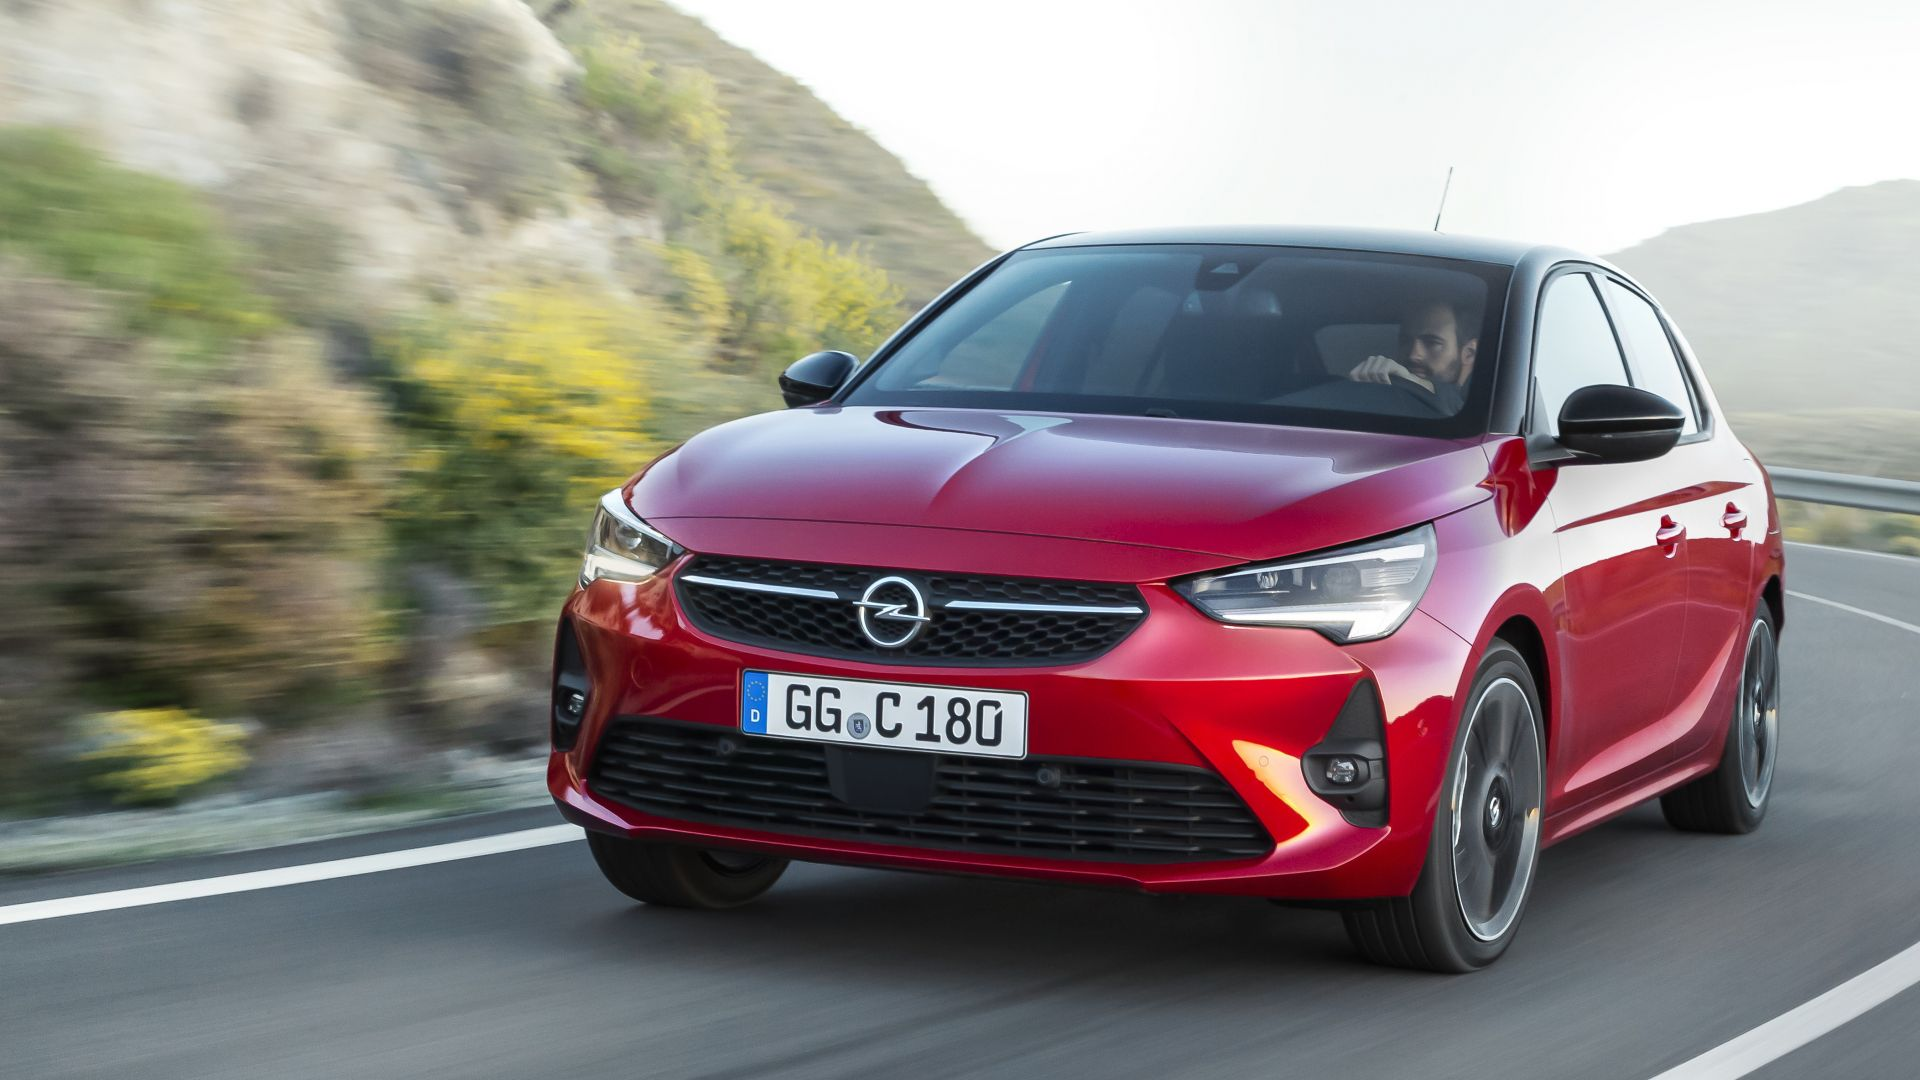 Nuova Opel Corsa 2019  Gli Allestimenti  I Motori Diesel E Benzina